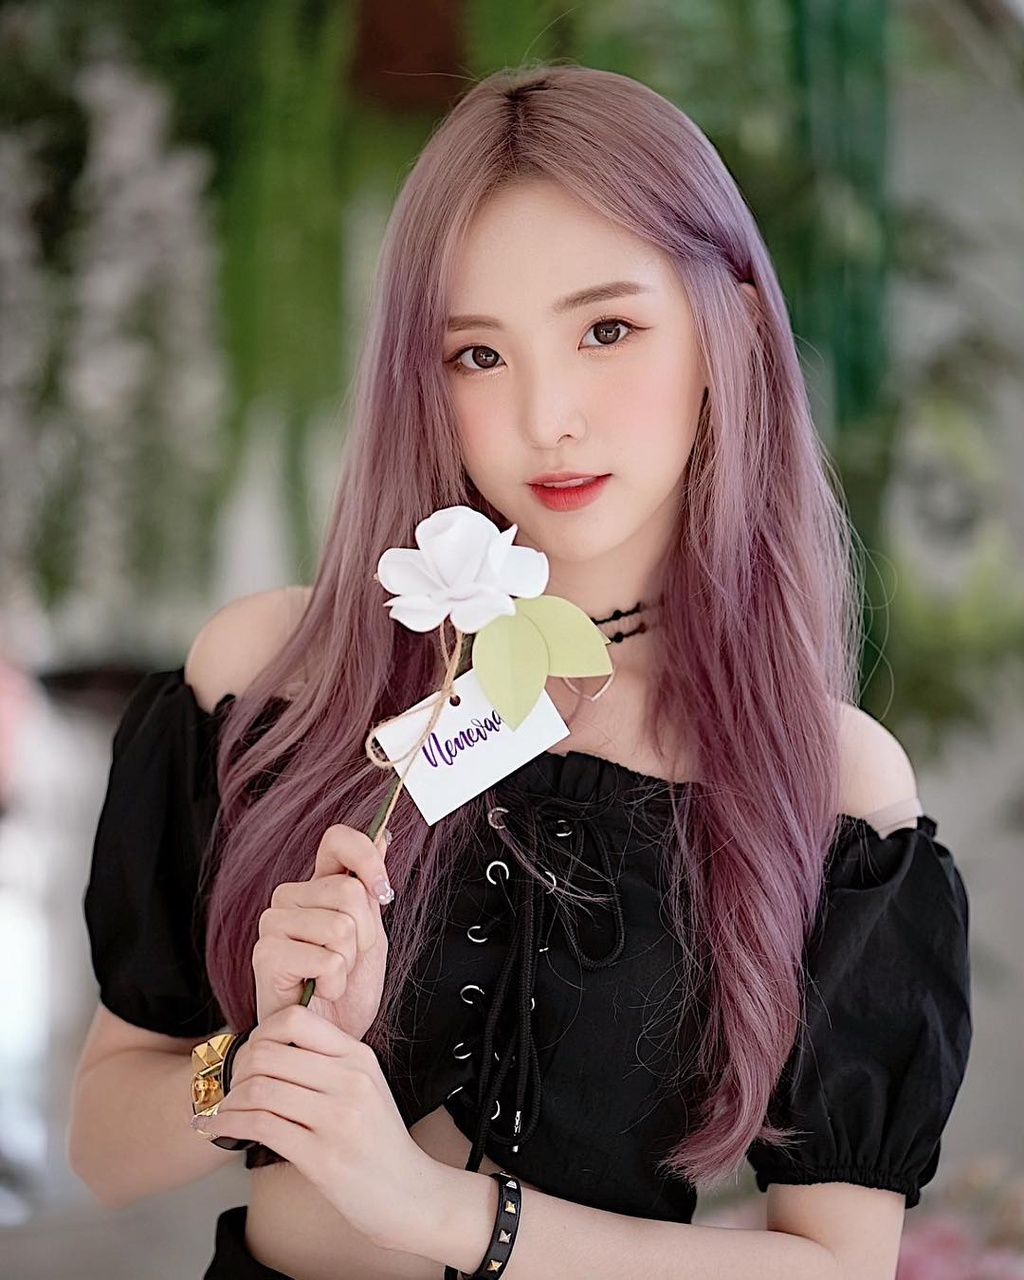 Hot girl 'Lat mat 3' cua Ly Hai tham gia show song con ban Trung hinh anh 7 53270949_407618566683397_1617227399830140179_n.jpg